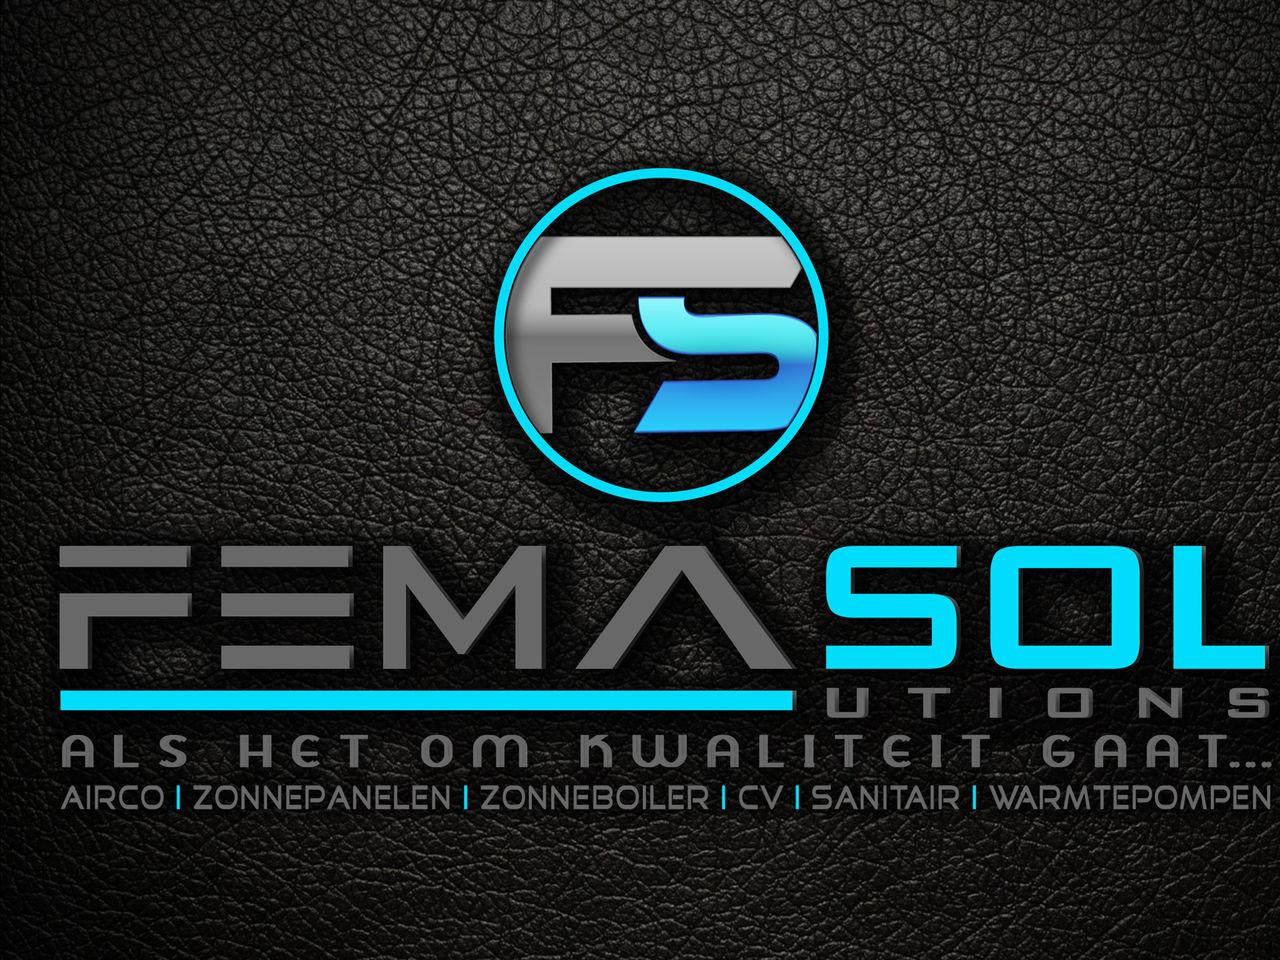 Logo Femasol